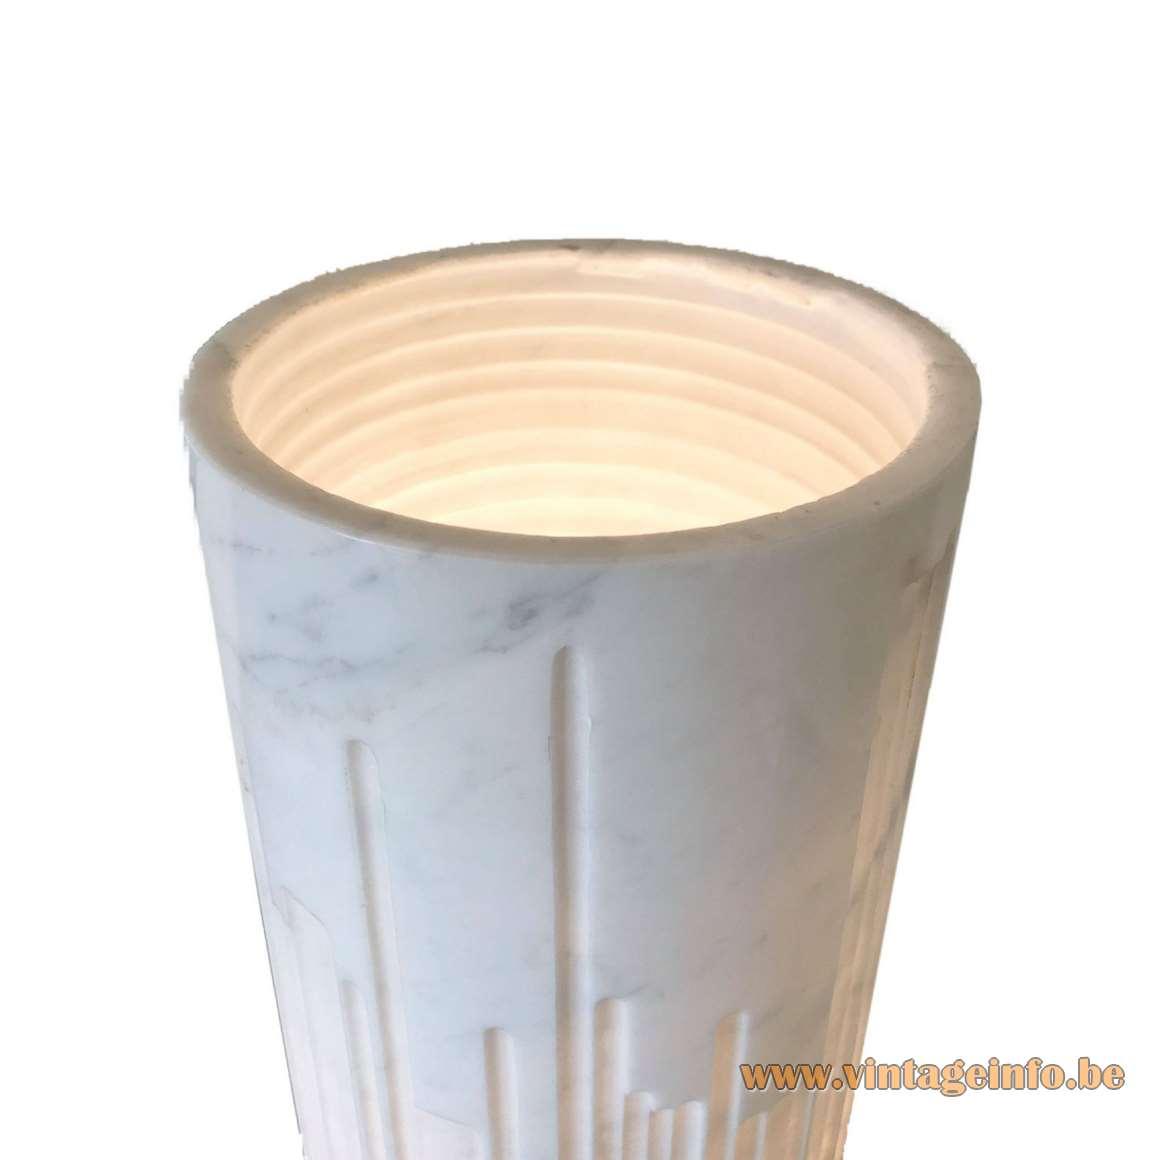 Grupo NP2 cylindrical marble table lamp calacatta carrara tube design: Nerone Ceccarelli Giancarlo Patuzzi 1960s 1970s